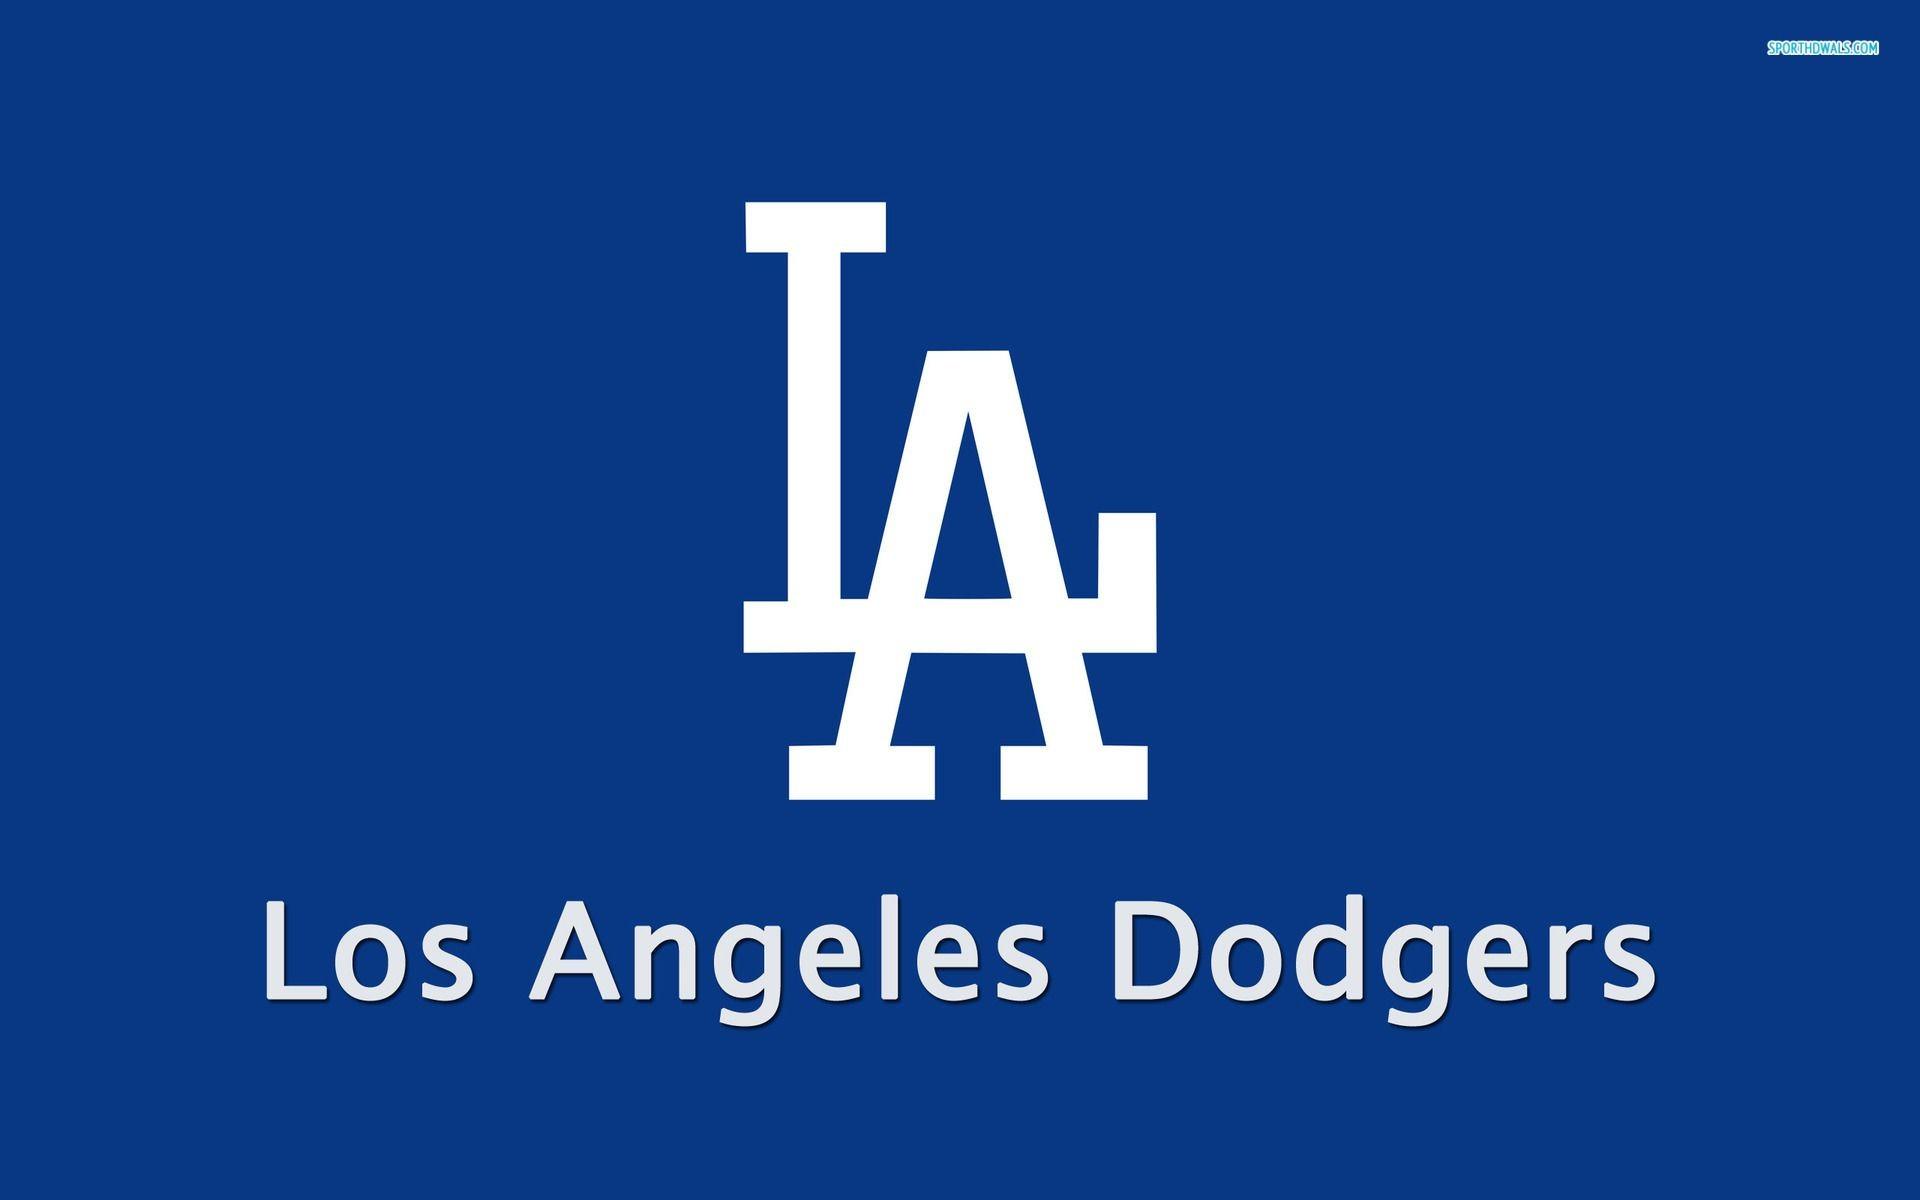 Los Angeles Dodgers Wallpaper 183 ①